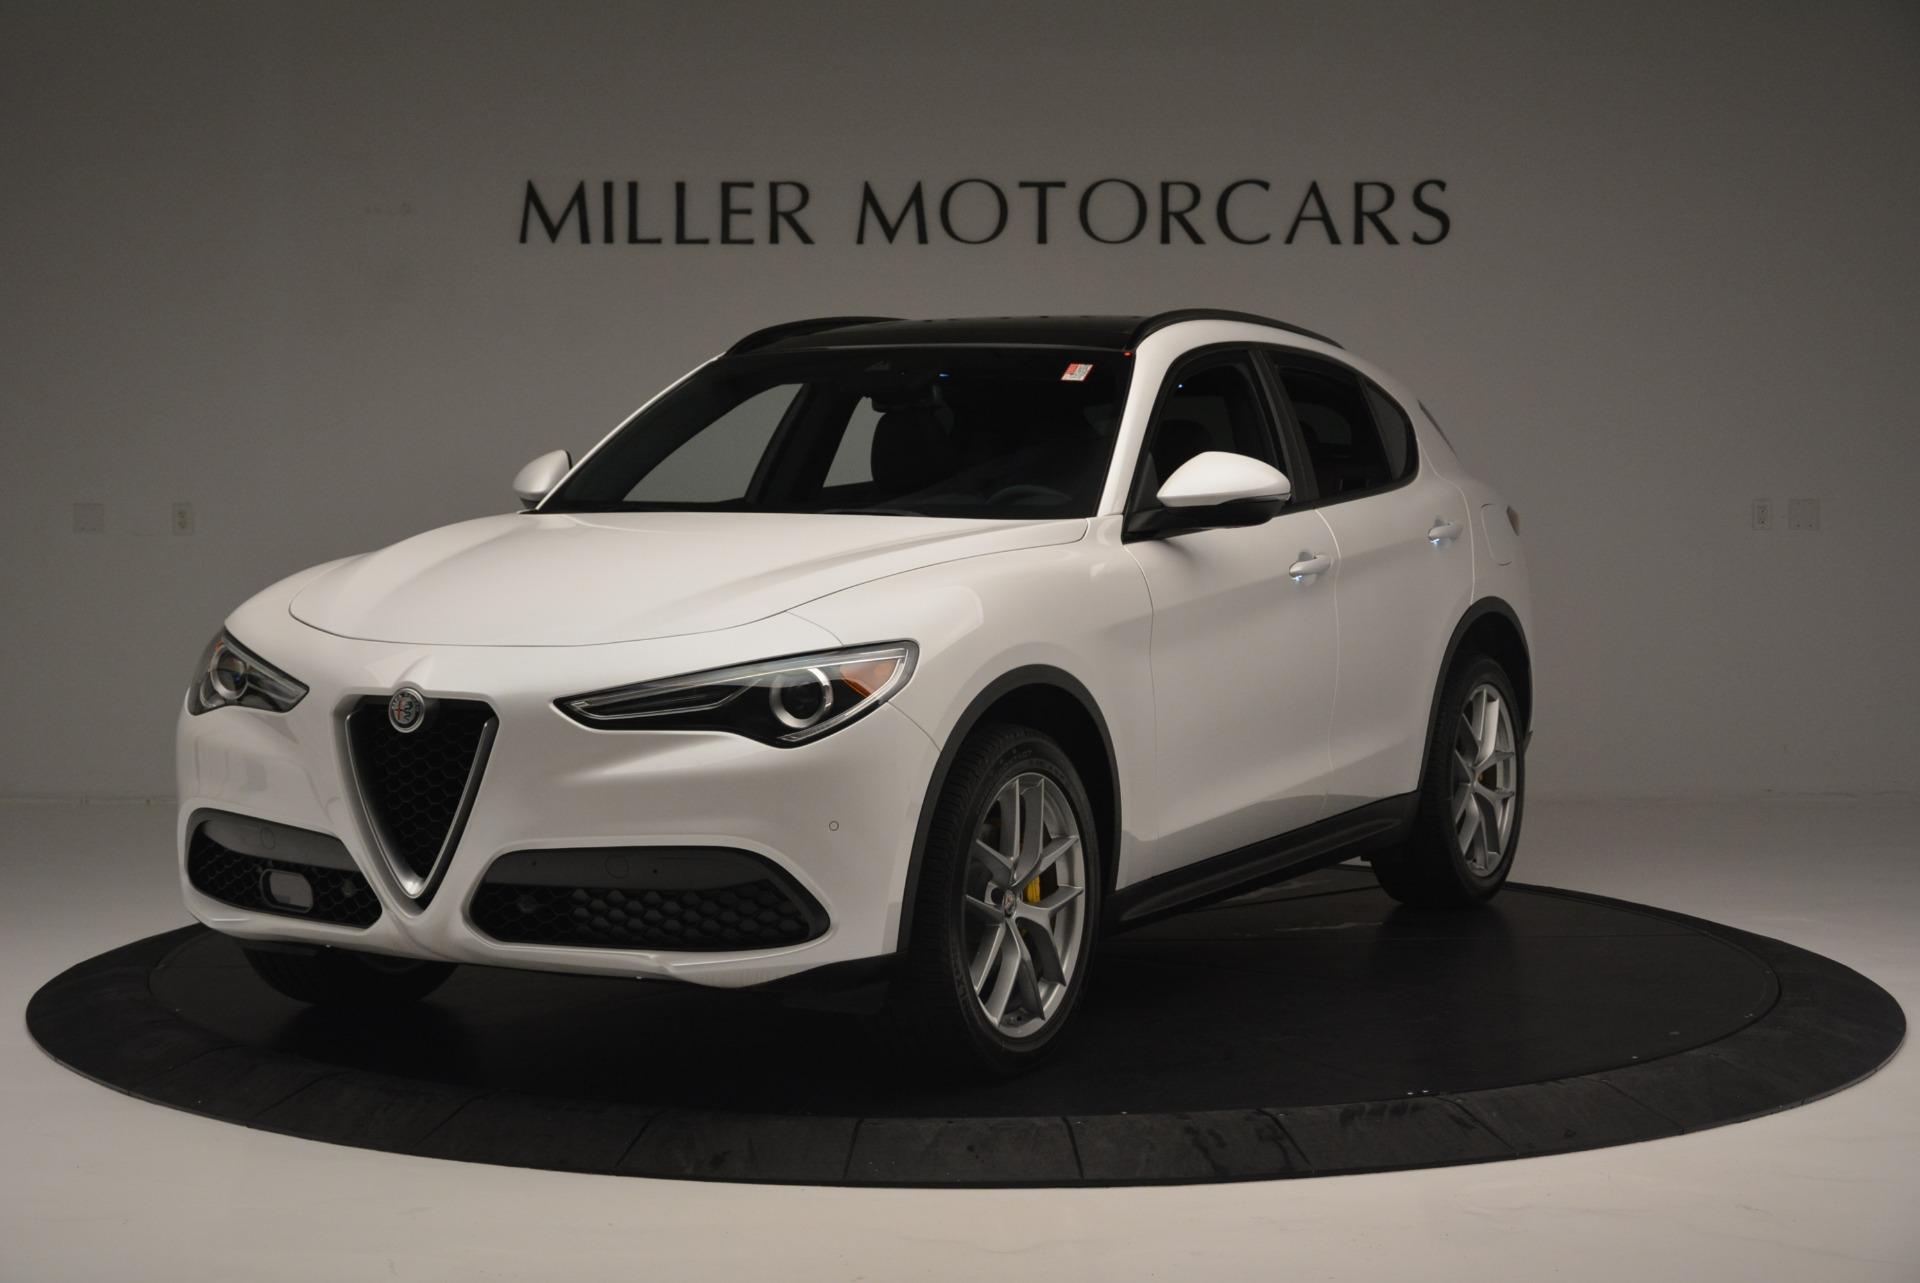 Used 2018 Alfa Romeo Stelvio Ti Sport Q4 for sale $36,900 at Pagani of Greenwich in Greenwich CT 06830 1